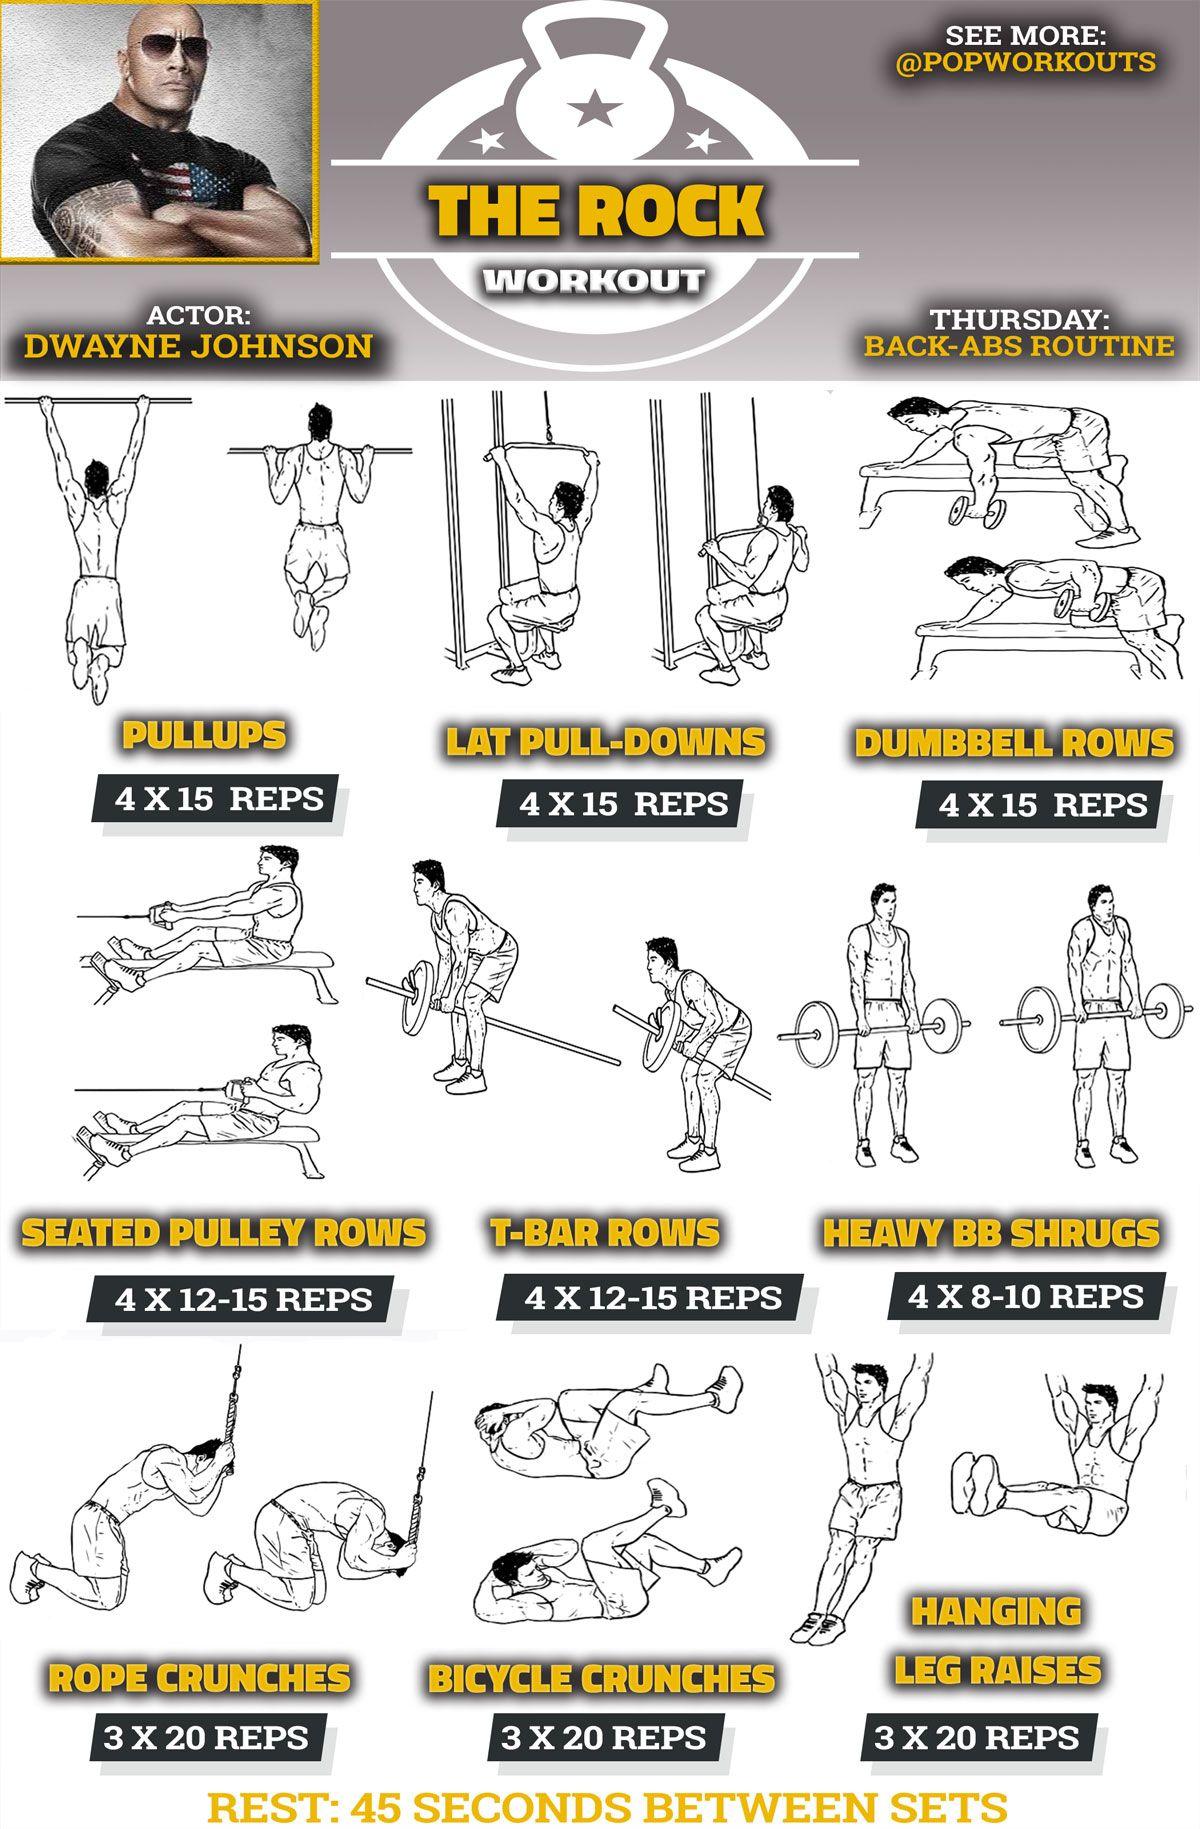 workout exercises workout routines ab routine the rock workout routine